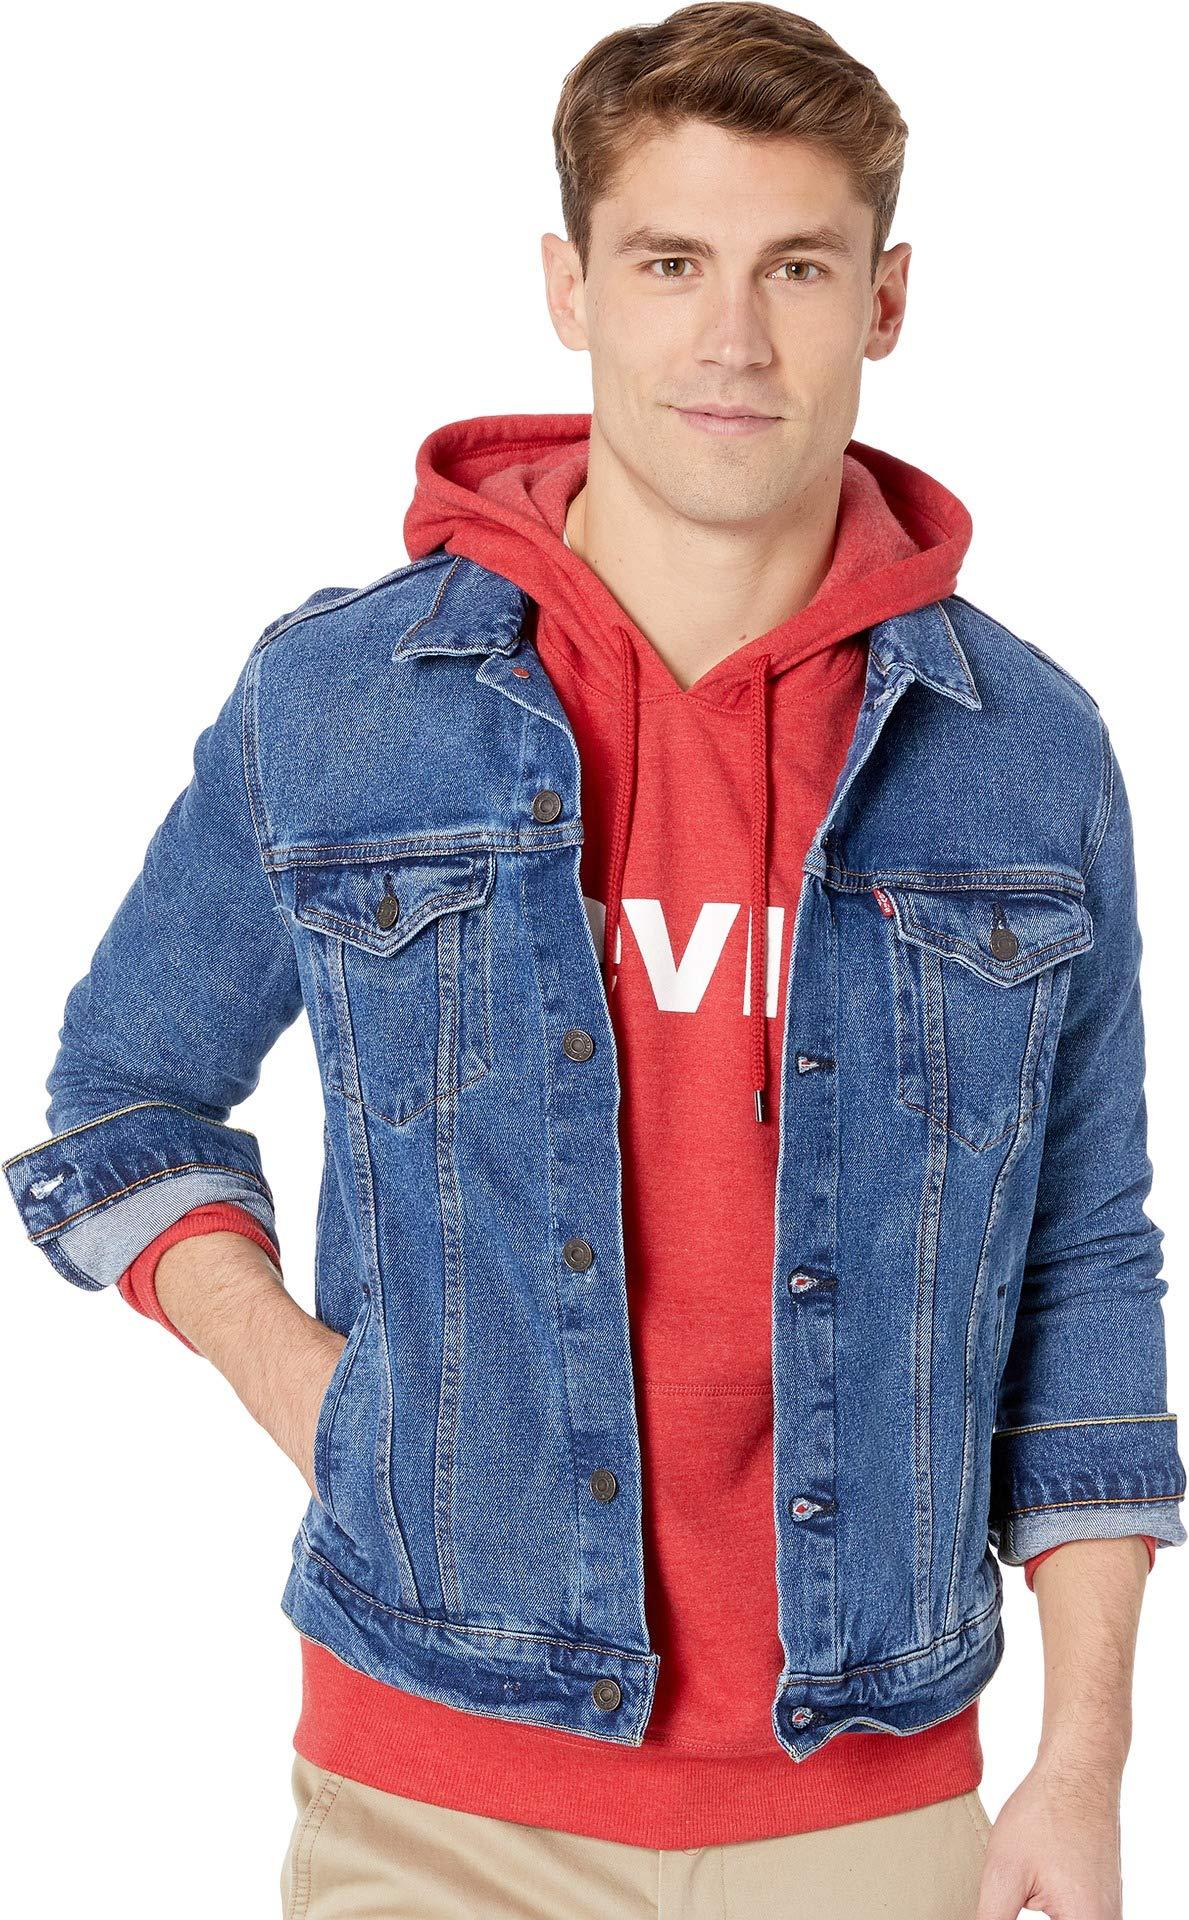 Levi's Men's Original Trucker Jacket, The Hype/Stretch, M by Levi's